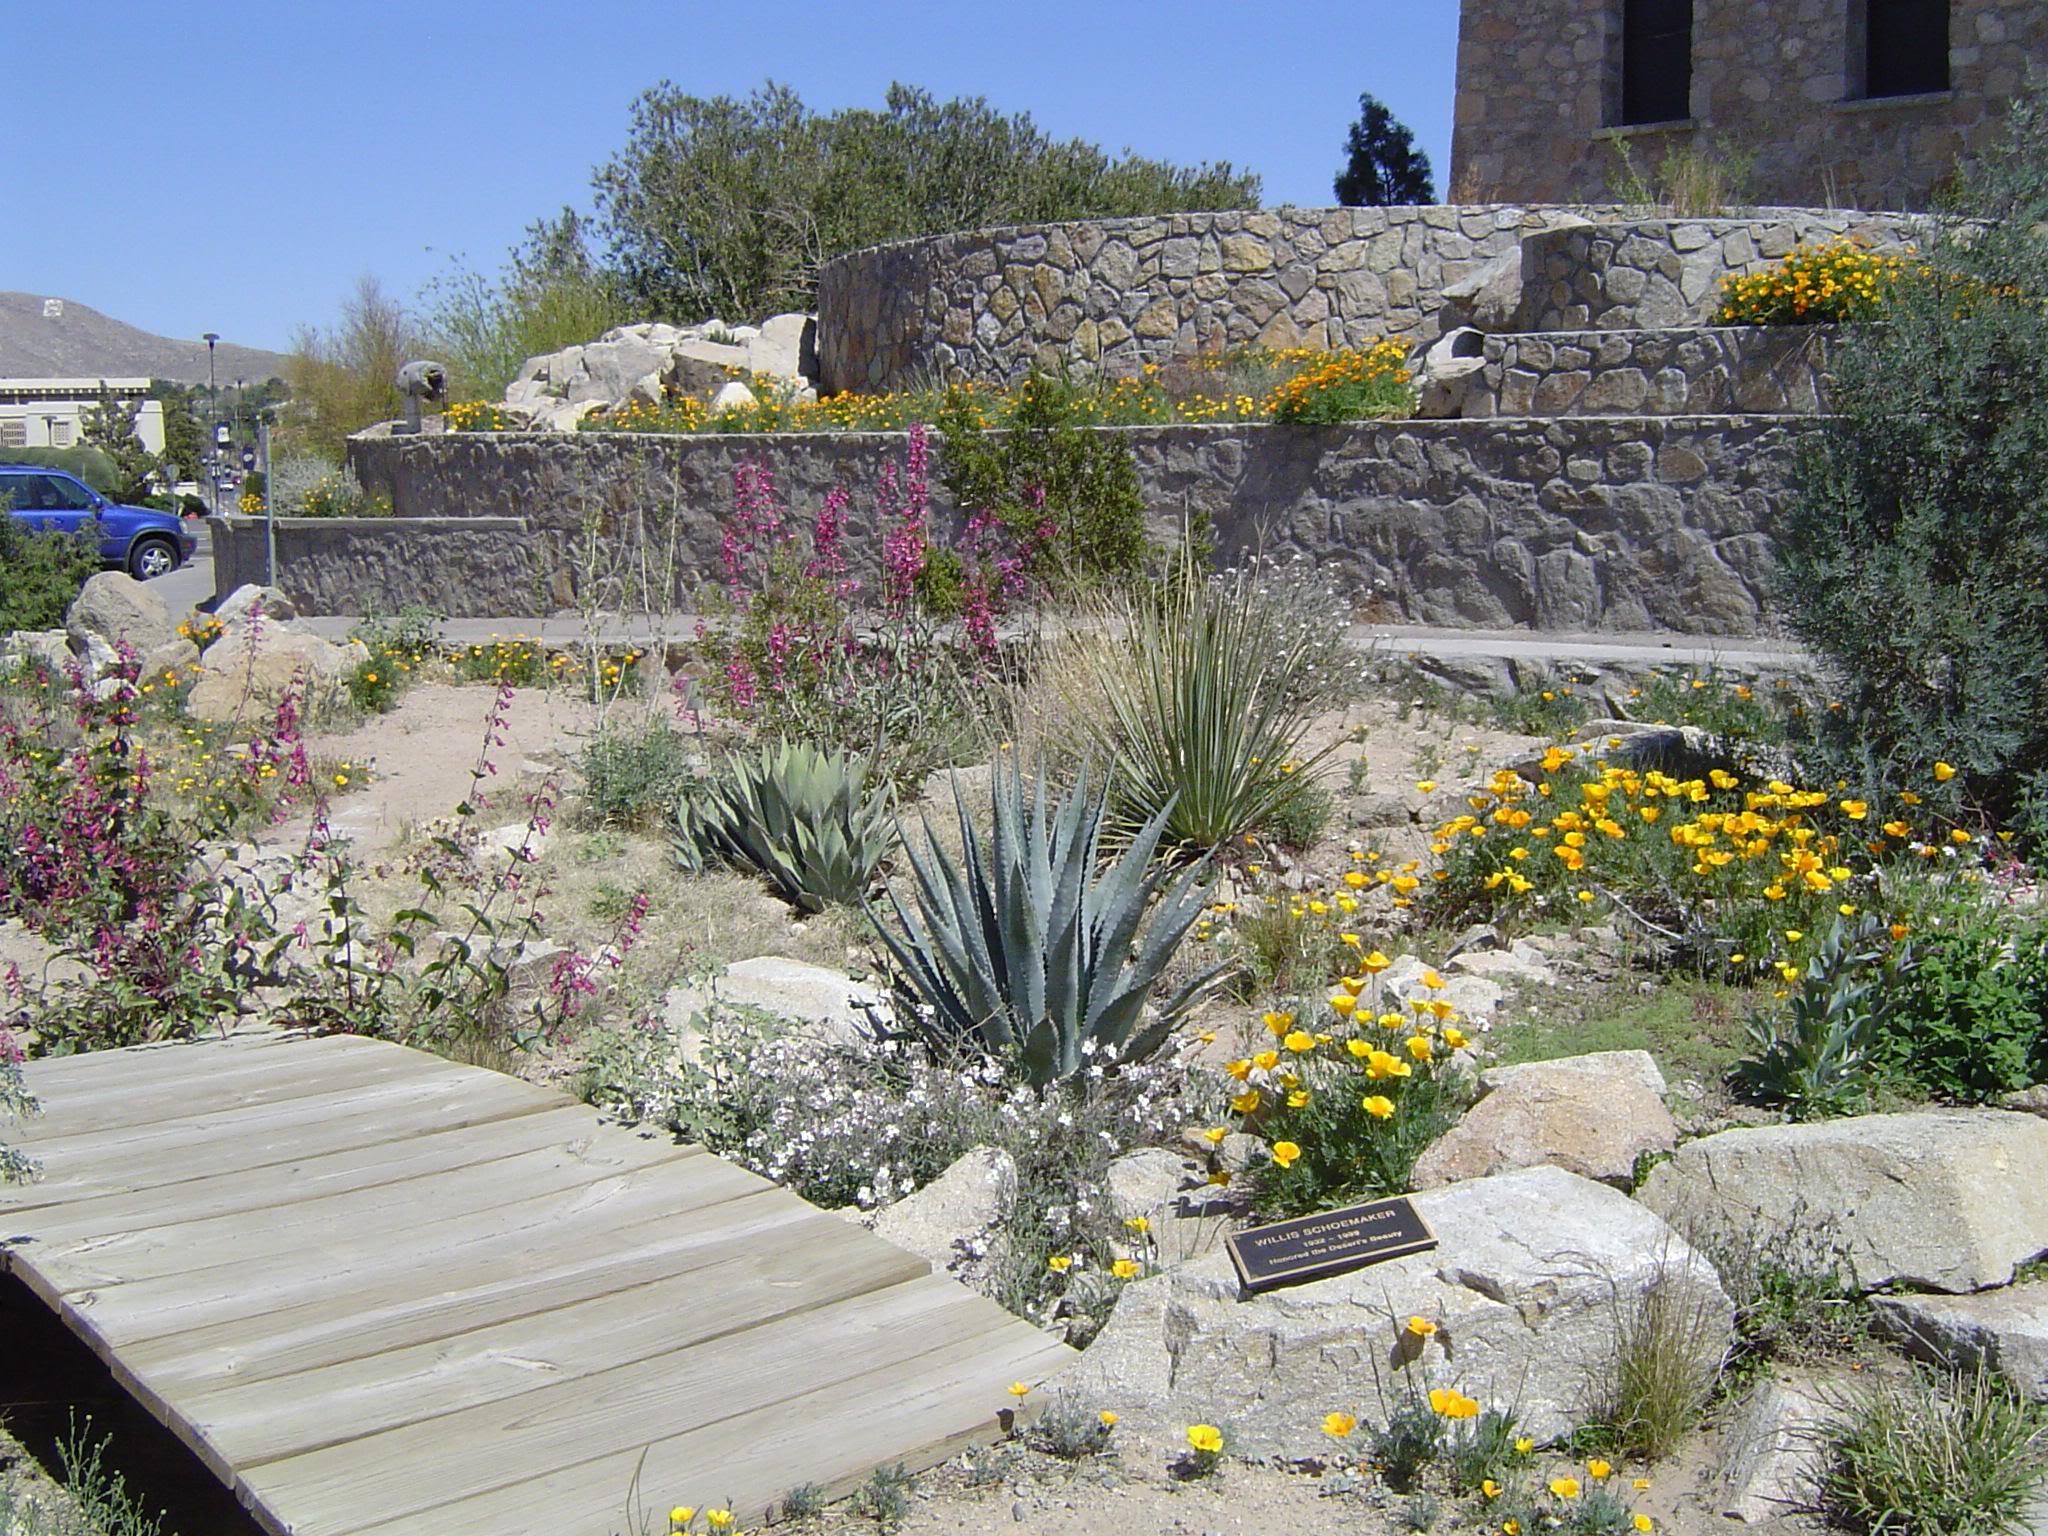 The Chihuahuan Desert Gardens